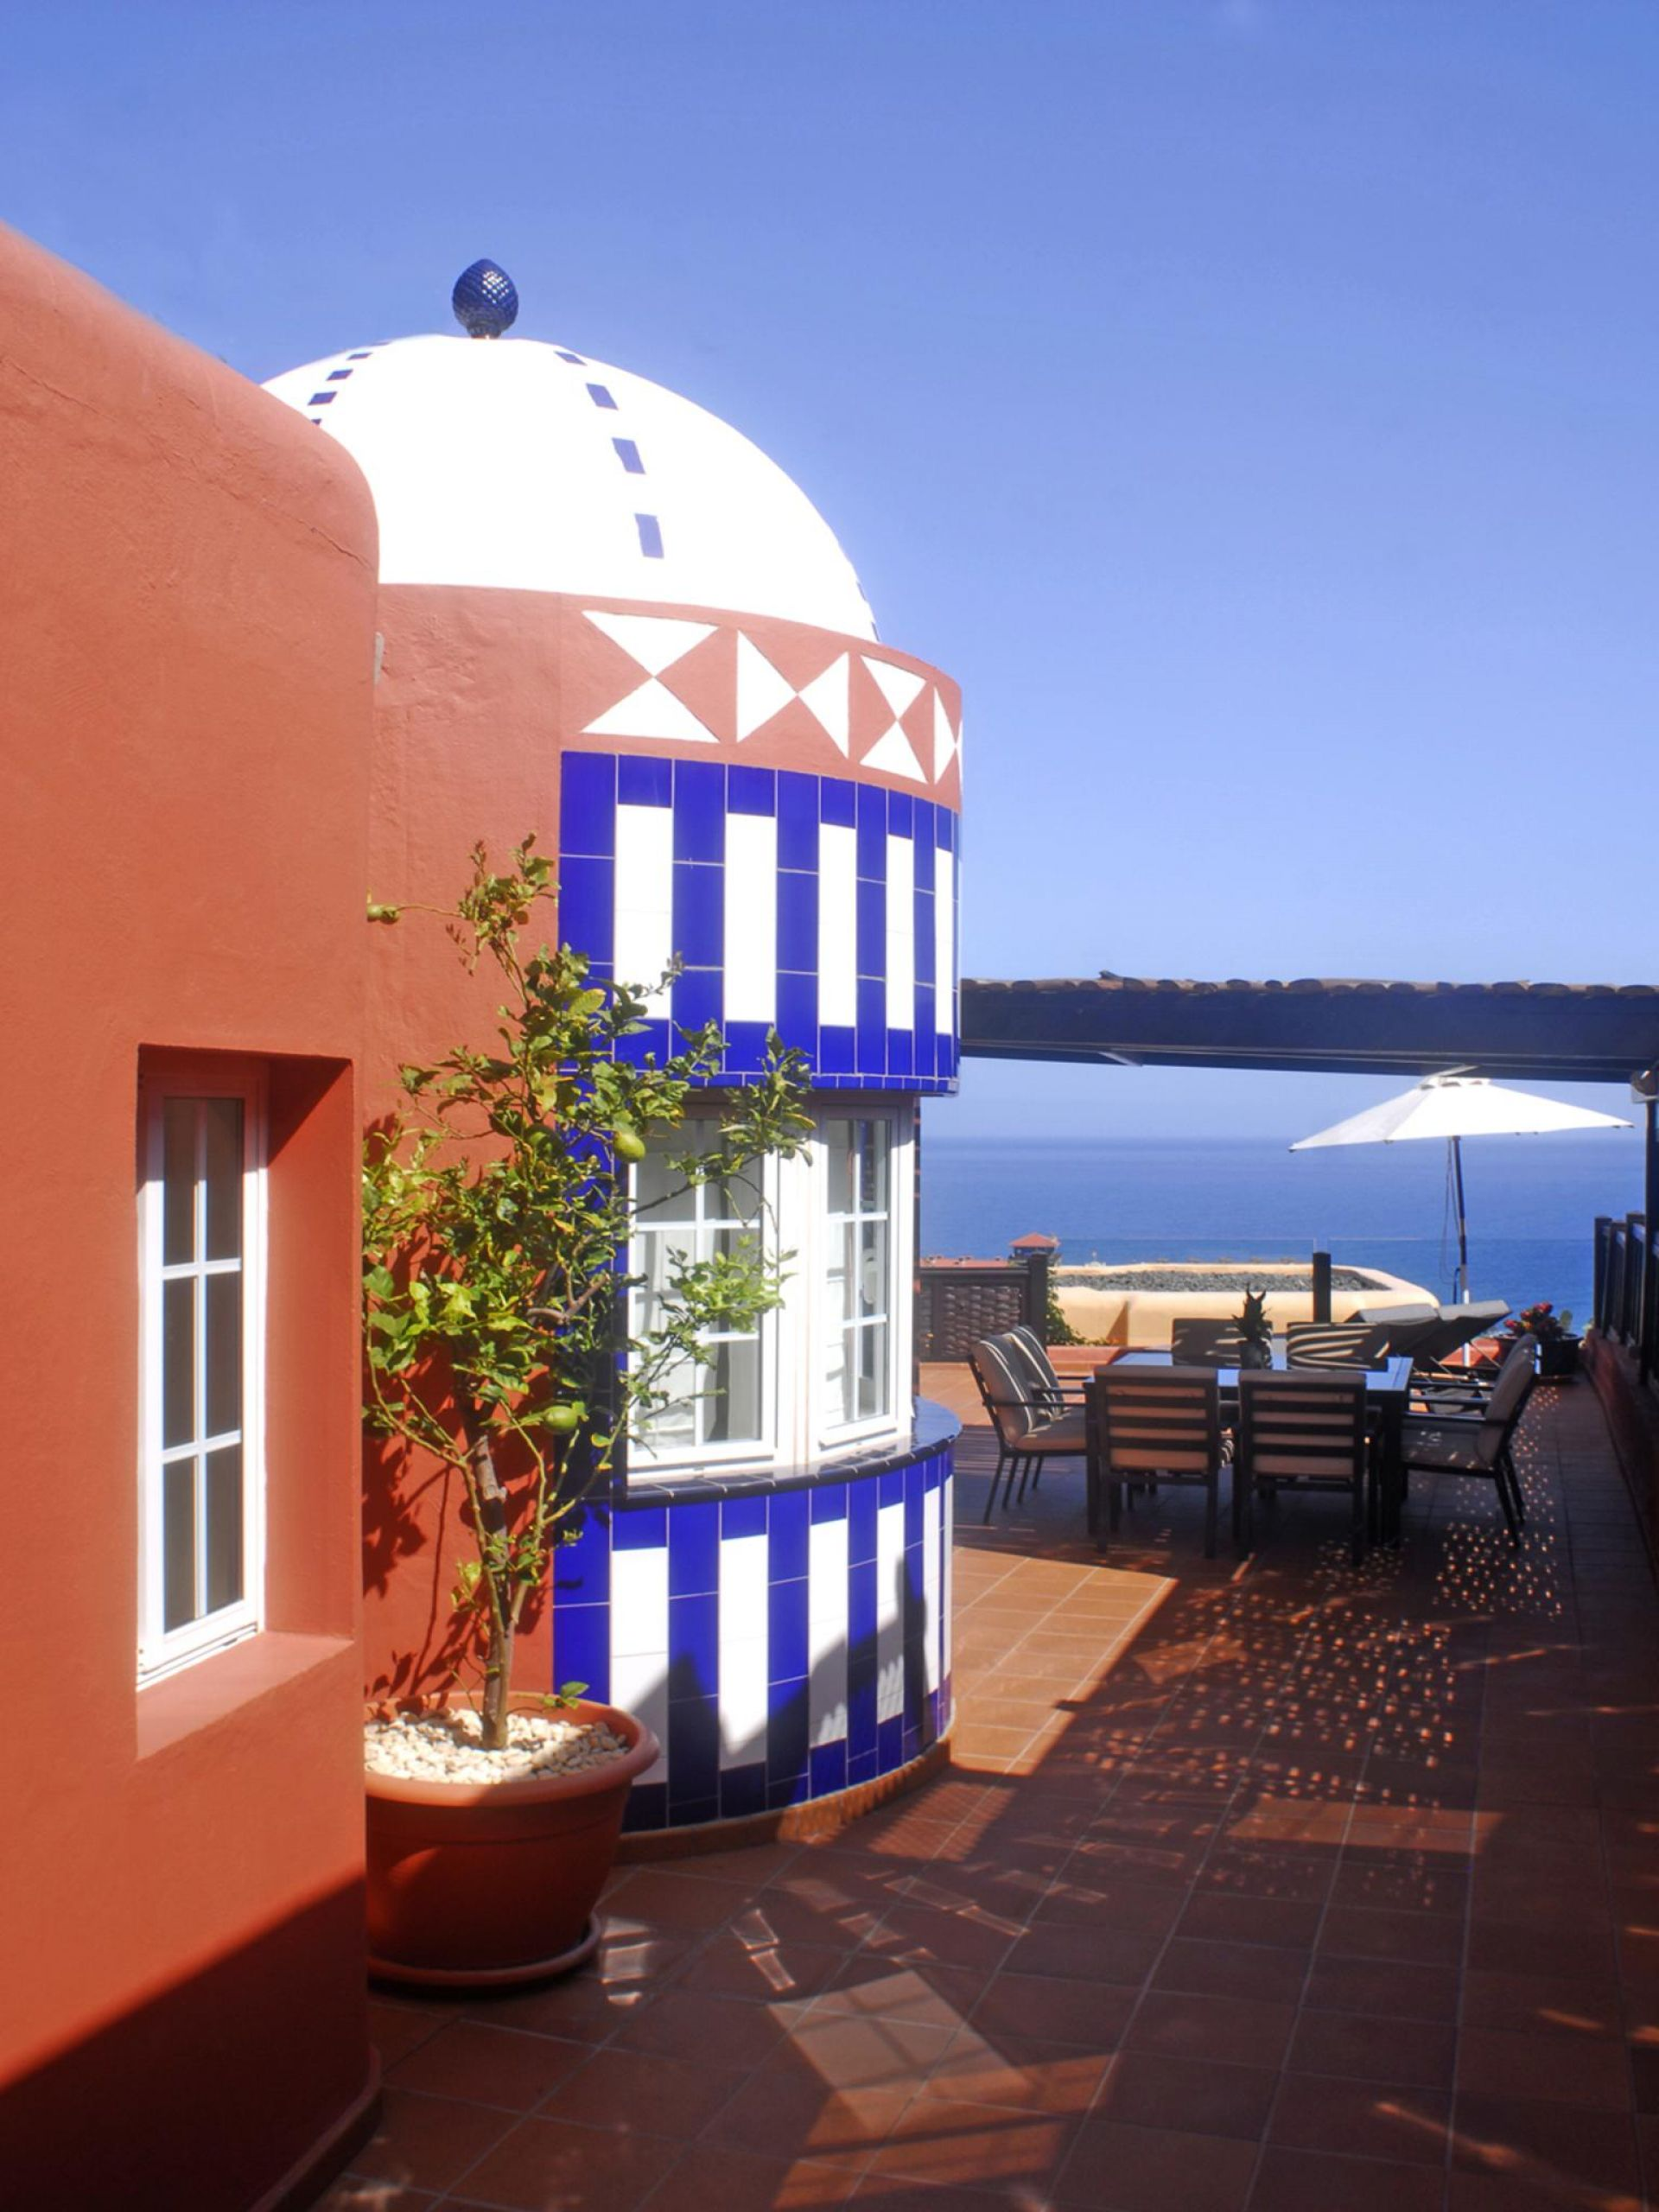 Holiday apartment Villa San Agustin 10 - Holiday Rental (854295), Maspalomas, Gran Canaria, Canary Islands, Spain, picture 5